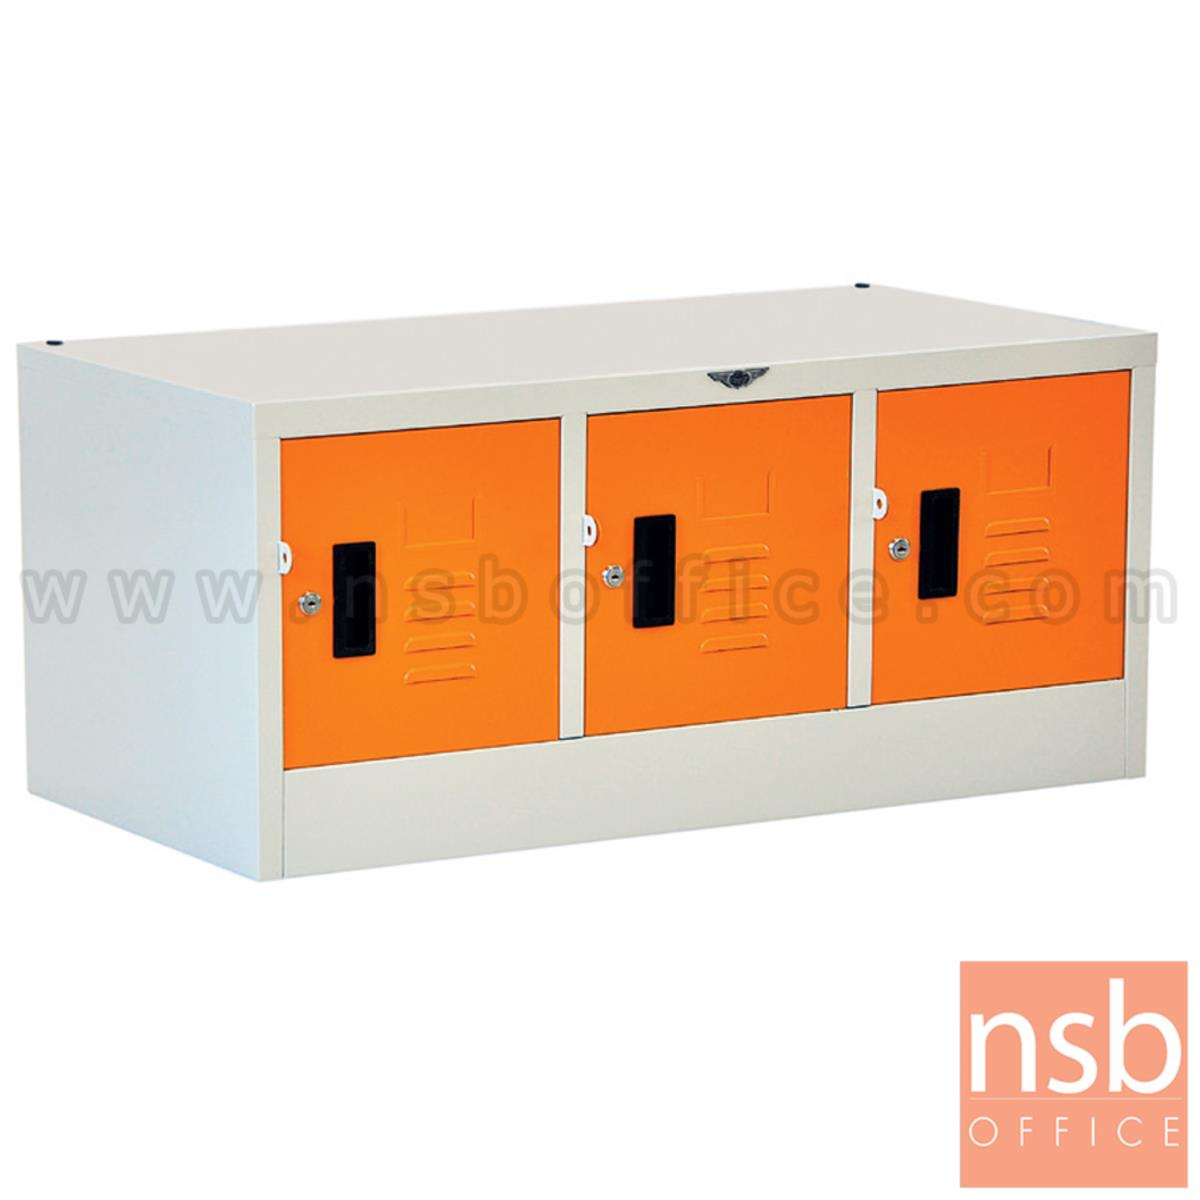 E08A032:ตู้ล็อกเกอร์เหล็กเตี้ยมินิ 3 ประตู  รุ่น Leah (ลีห์) ขนาด 91.2D*45.7W*40.8H cm.